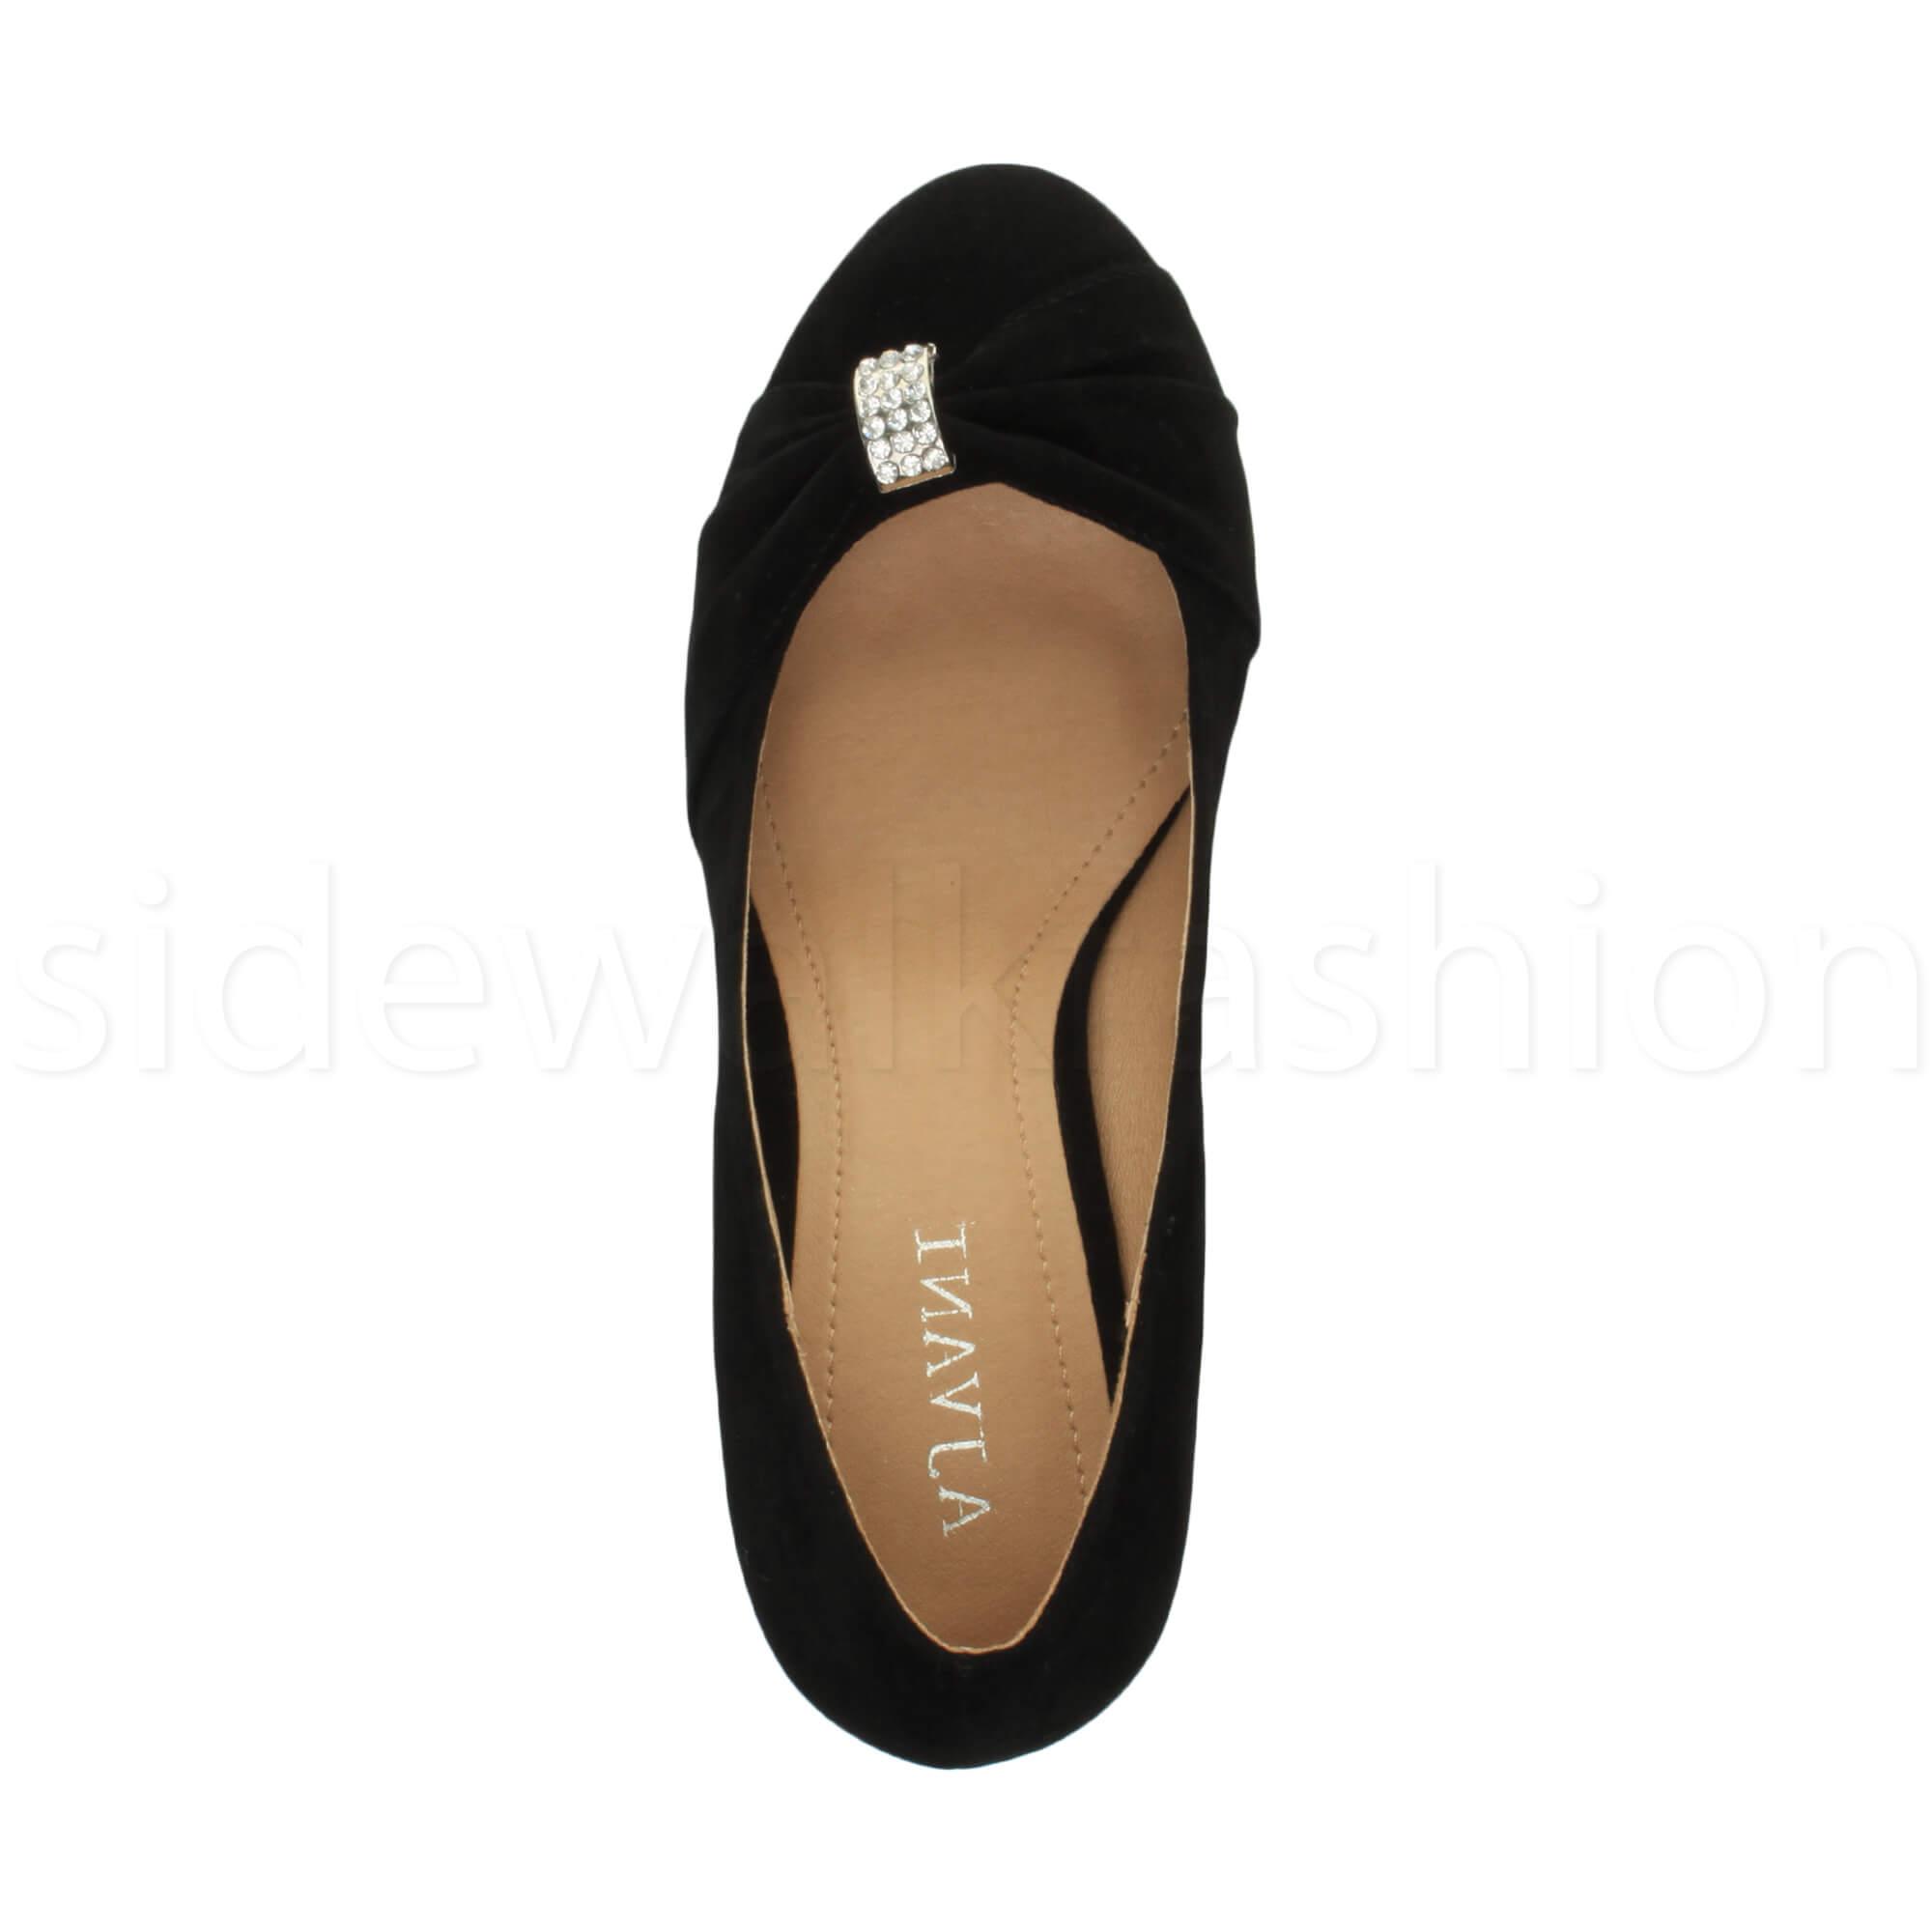 Womens-ladies-low-mid-heel-diamante-party-smart-evening-court-shoes-size thumbnail 24